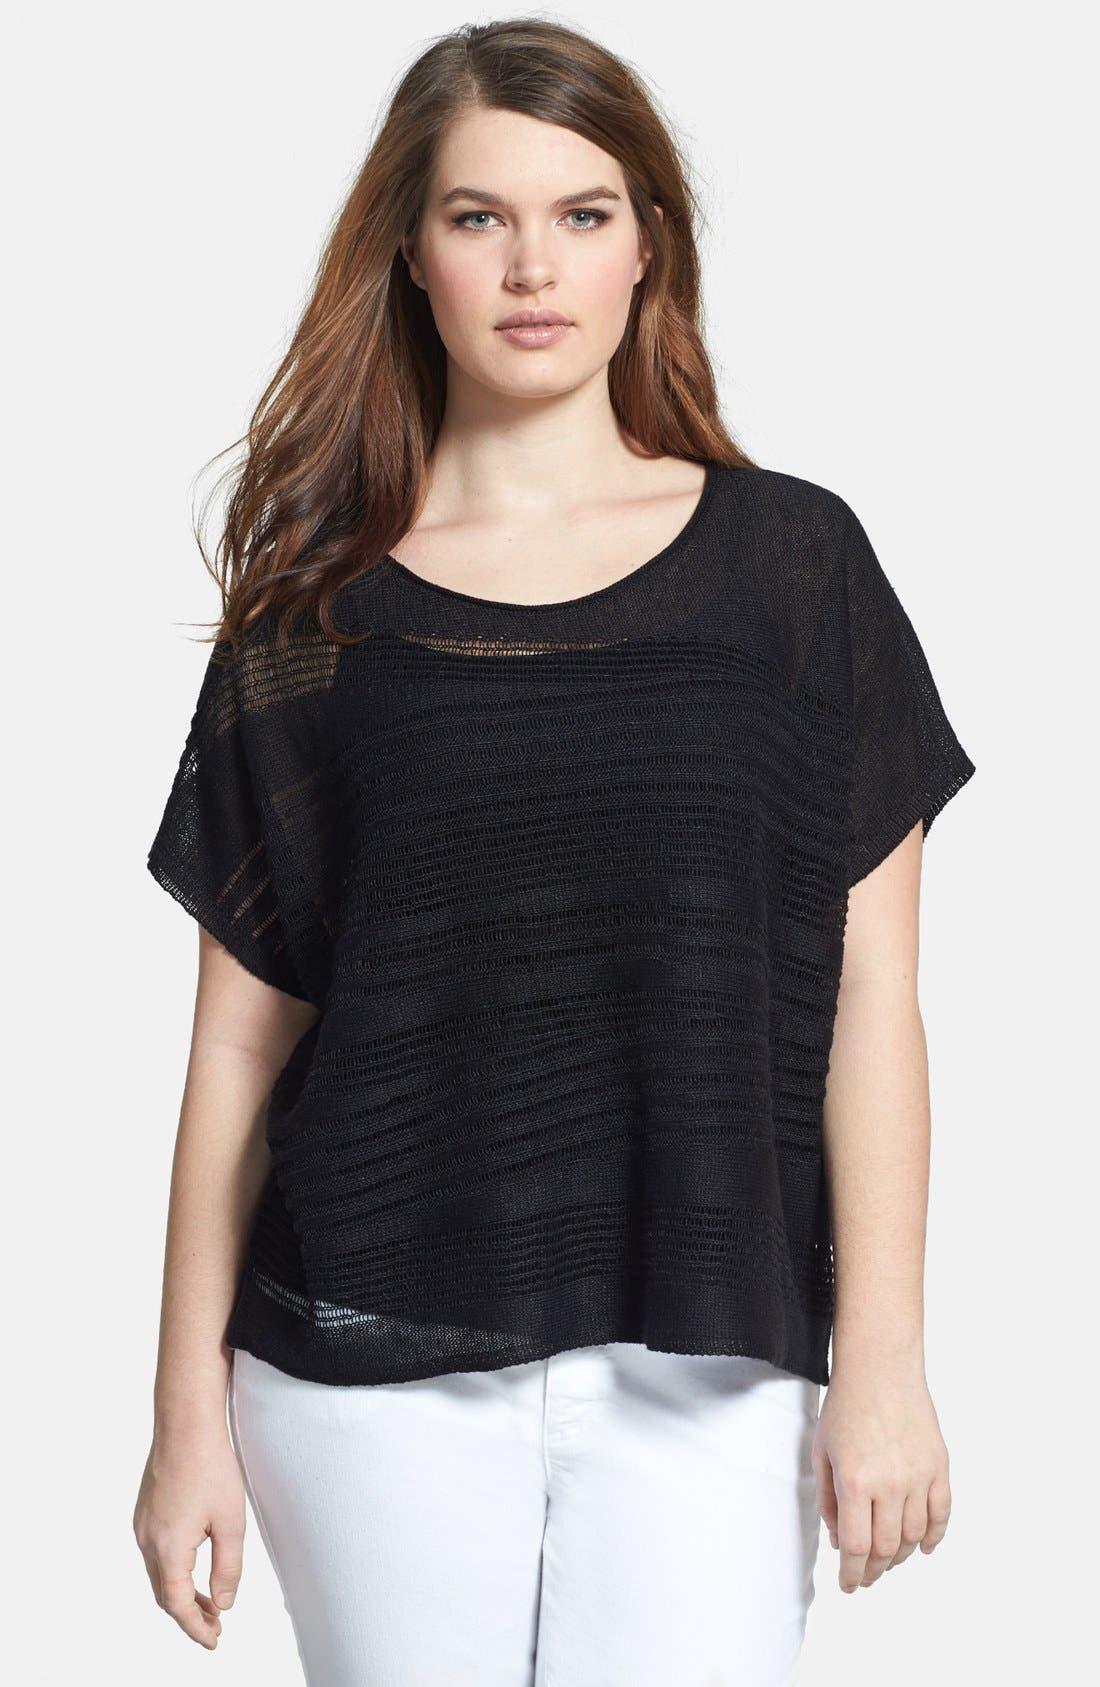 Main Image - Eileen Fisher Bateau Neck Pointelle Knit Organic Linen Top (Plus Size)